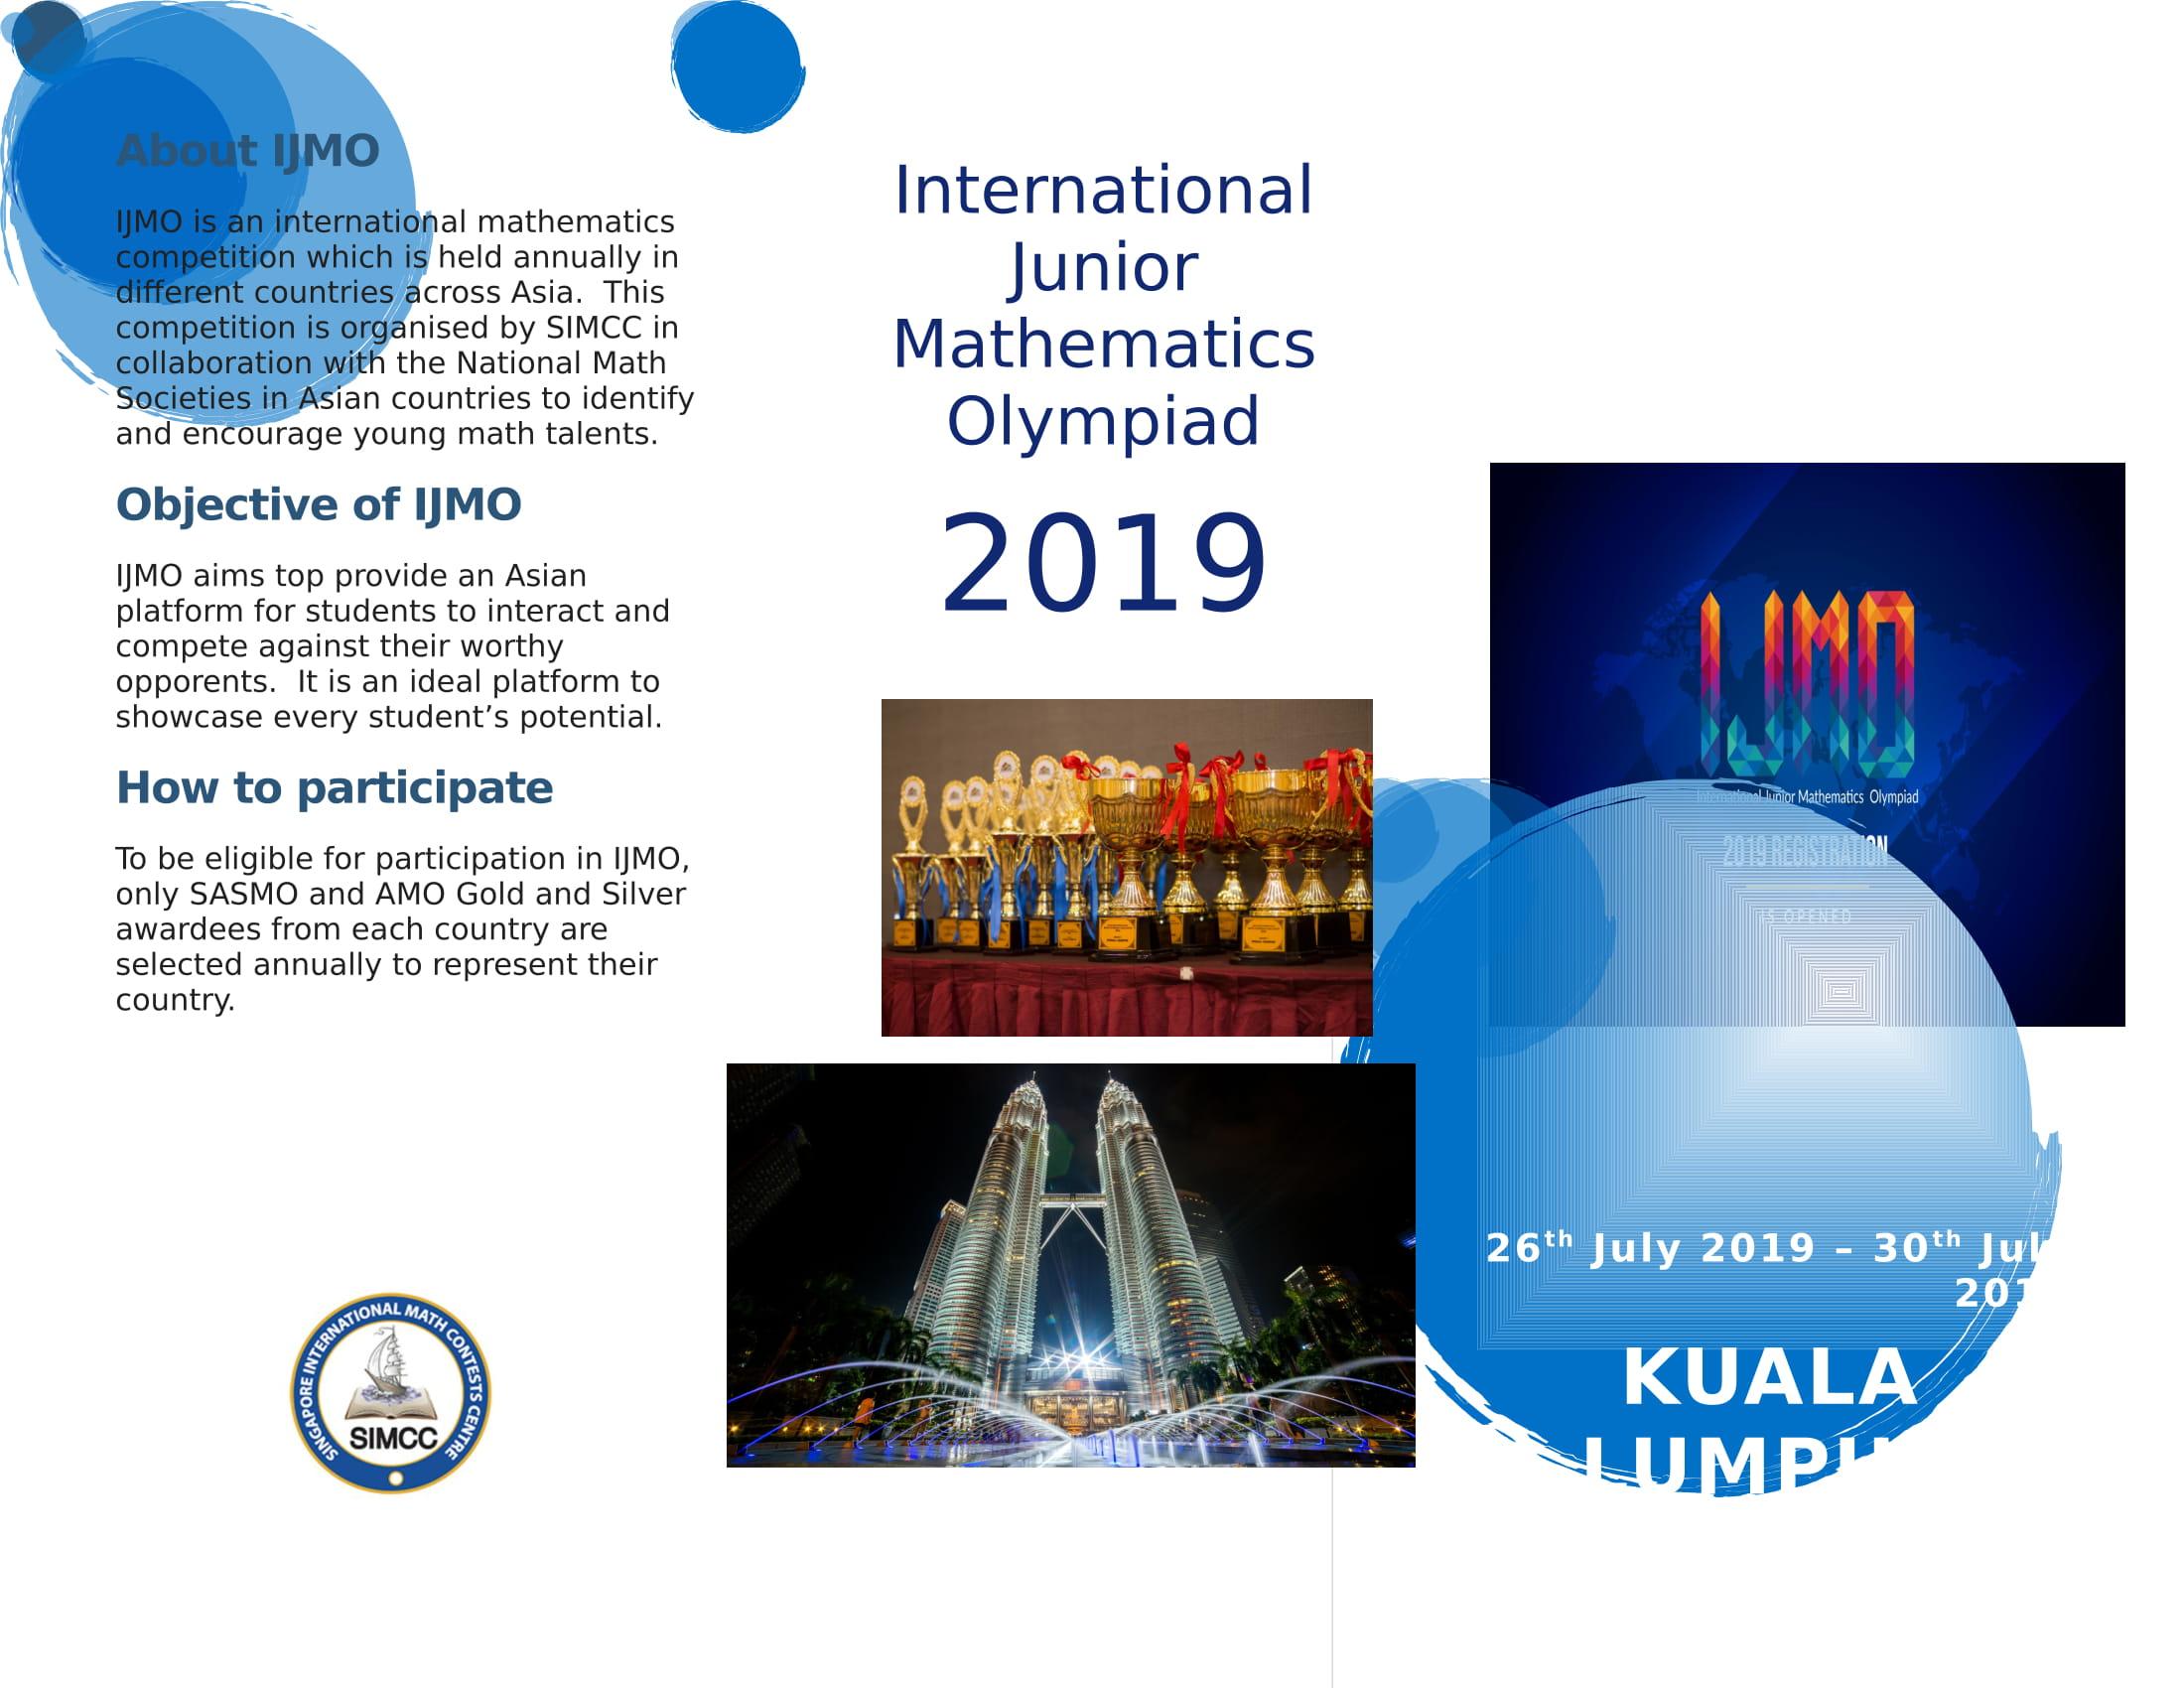 International Mathematics Olympiad 2019 - Tips and Tricks